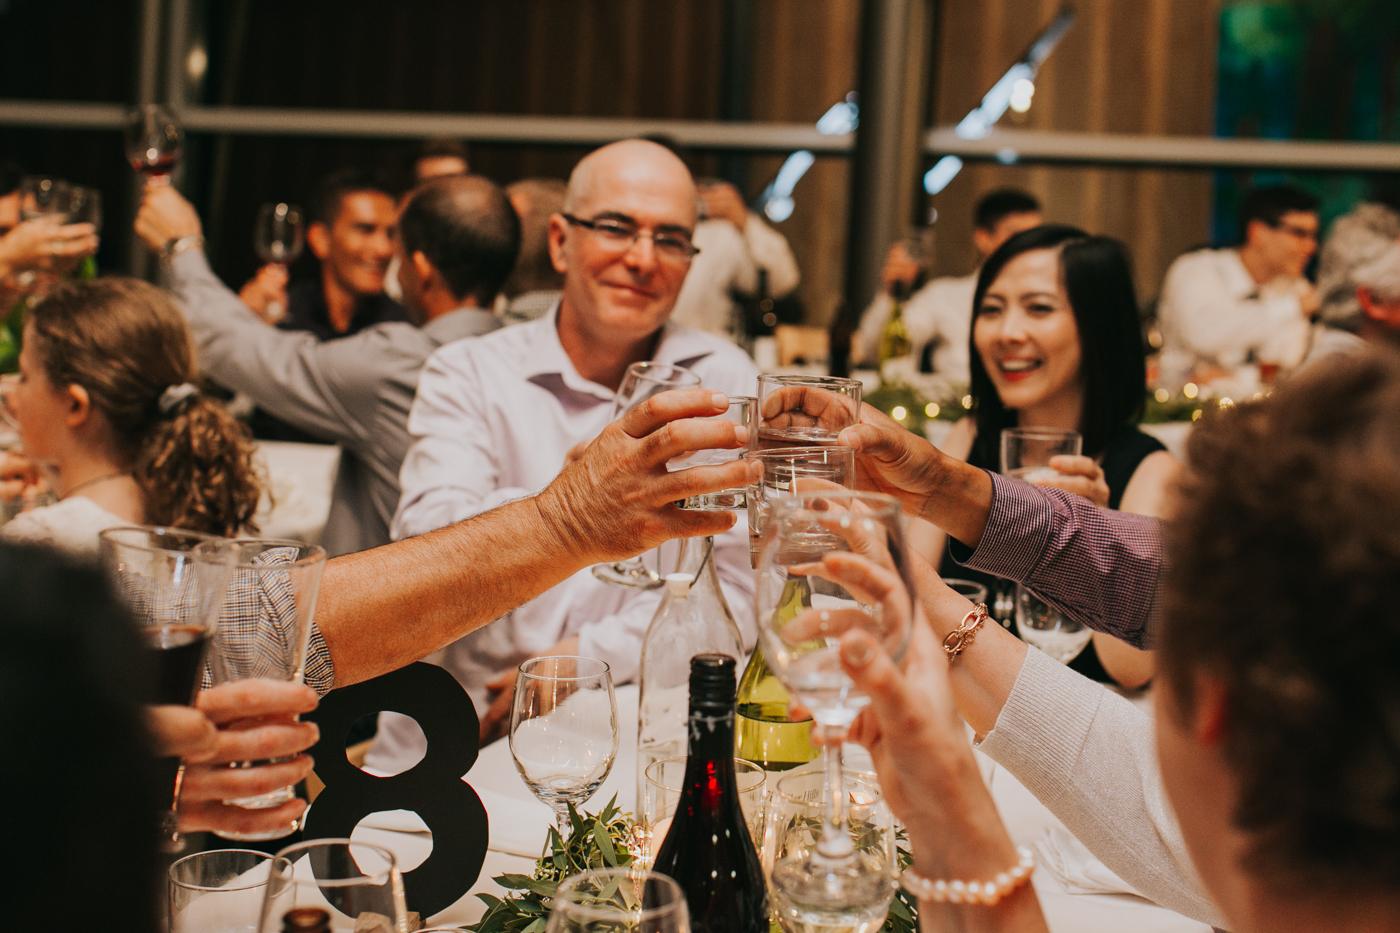 Ariana & Tim - Dunedin, New Zealand Wedding - Destination Wedding - Samantha Heather Photography-274.jpg